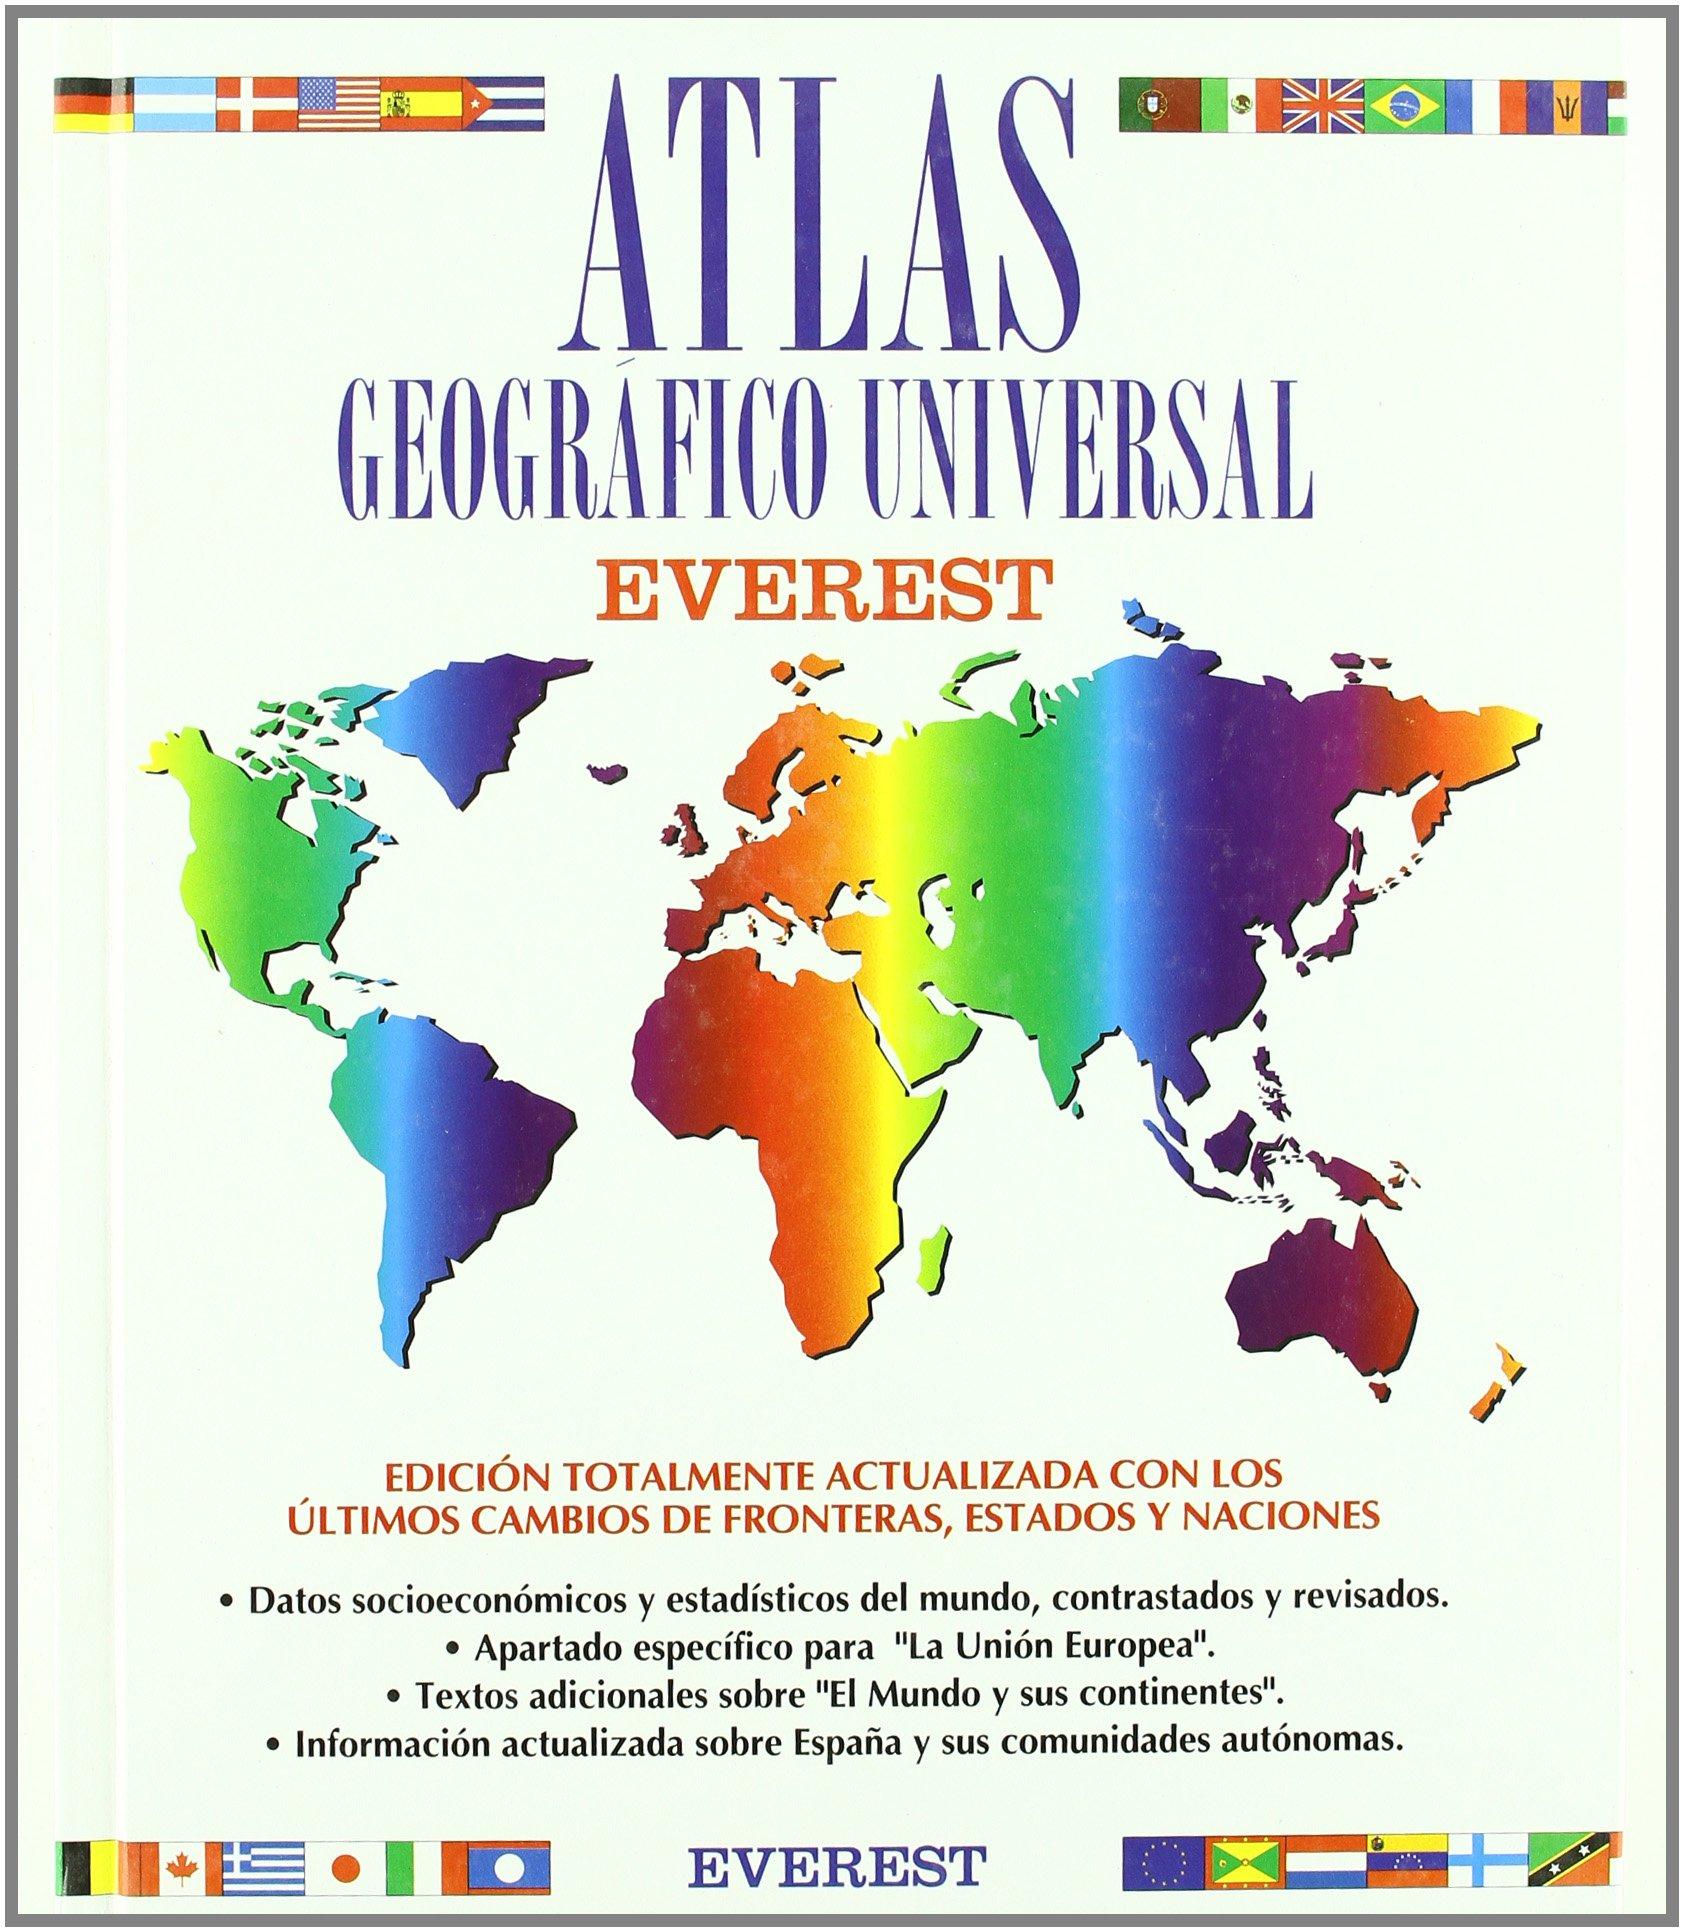 Atlas geográfico universal (Atlas Everest): Amazon.es: V.V.A.A.: Libros